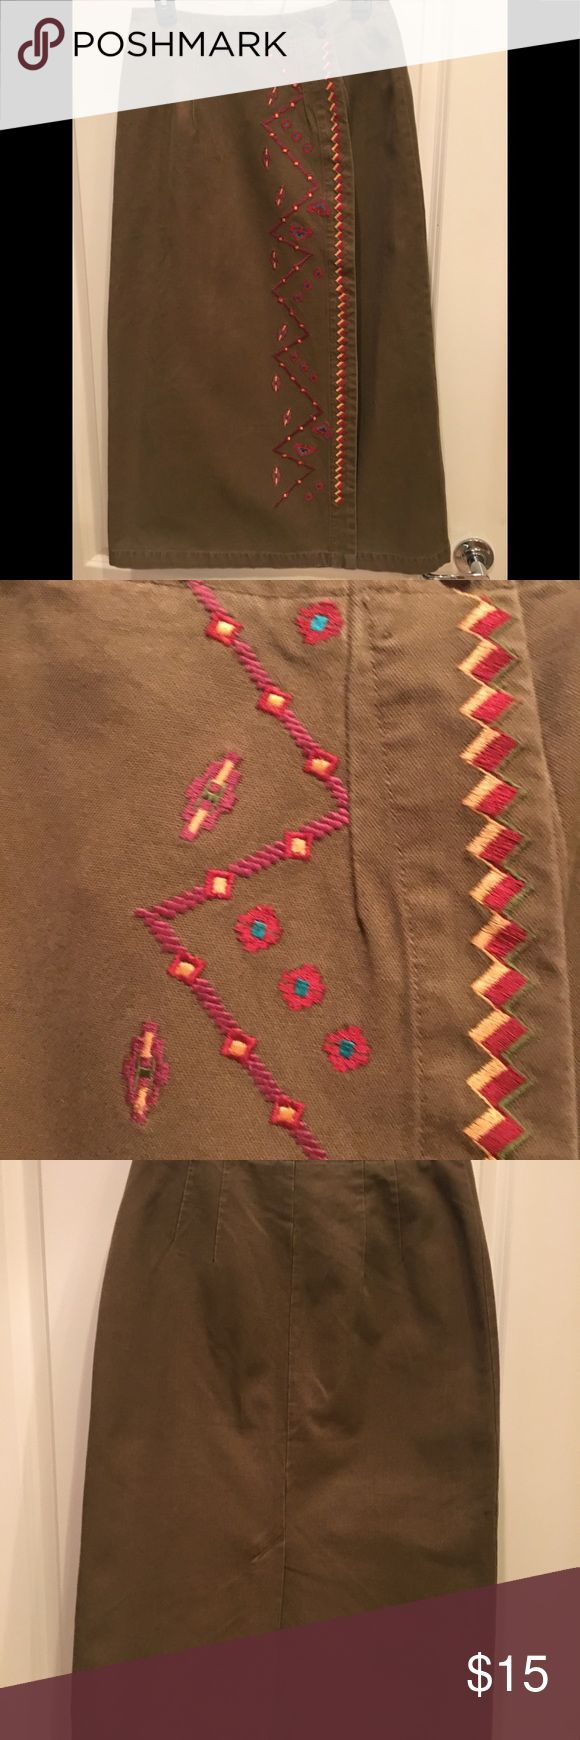 Selling this Ankle Length Wrap Around Denim Skirt w/ Embroidery on Poshmark! My username is: windycreek. #shopmycloset #poshmark #fashion #shopping #style #forsale #Ruff Hewn #Dresses & Skirts